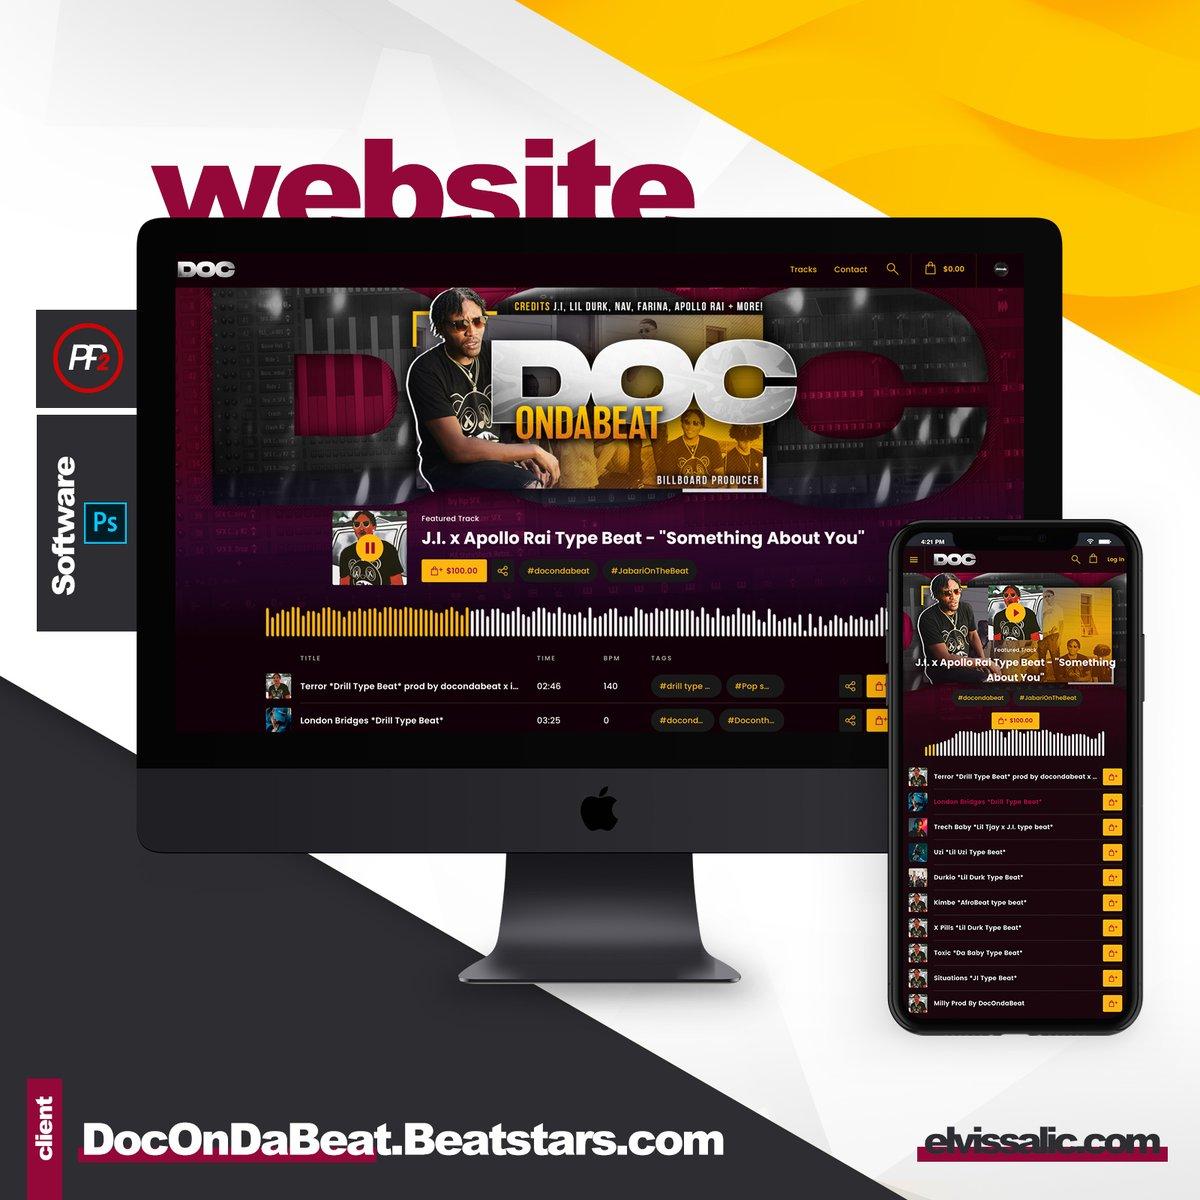 Beatstars Pro page 2 design for https://t.co/bsUCf4MpJ4  #graphic #design #graphicdesign #propage #beatstars #beats #music #artist #producer #sitedesign #photoshop #hiphop #designoftheday #hiphop #adobe #beatstars #propage #billboardproducer https://t.co/xmCOkf5iMw